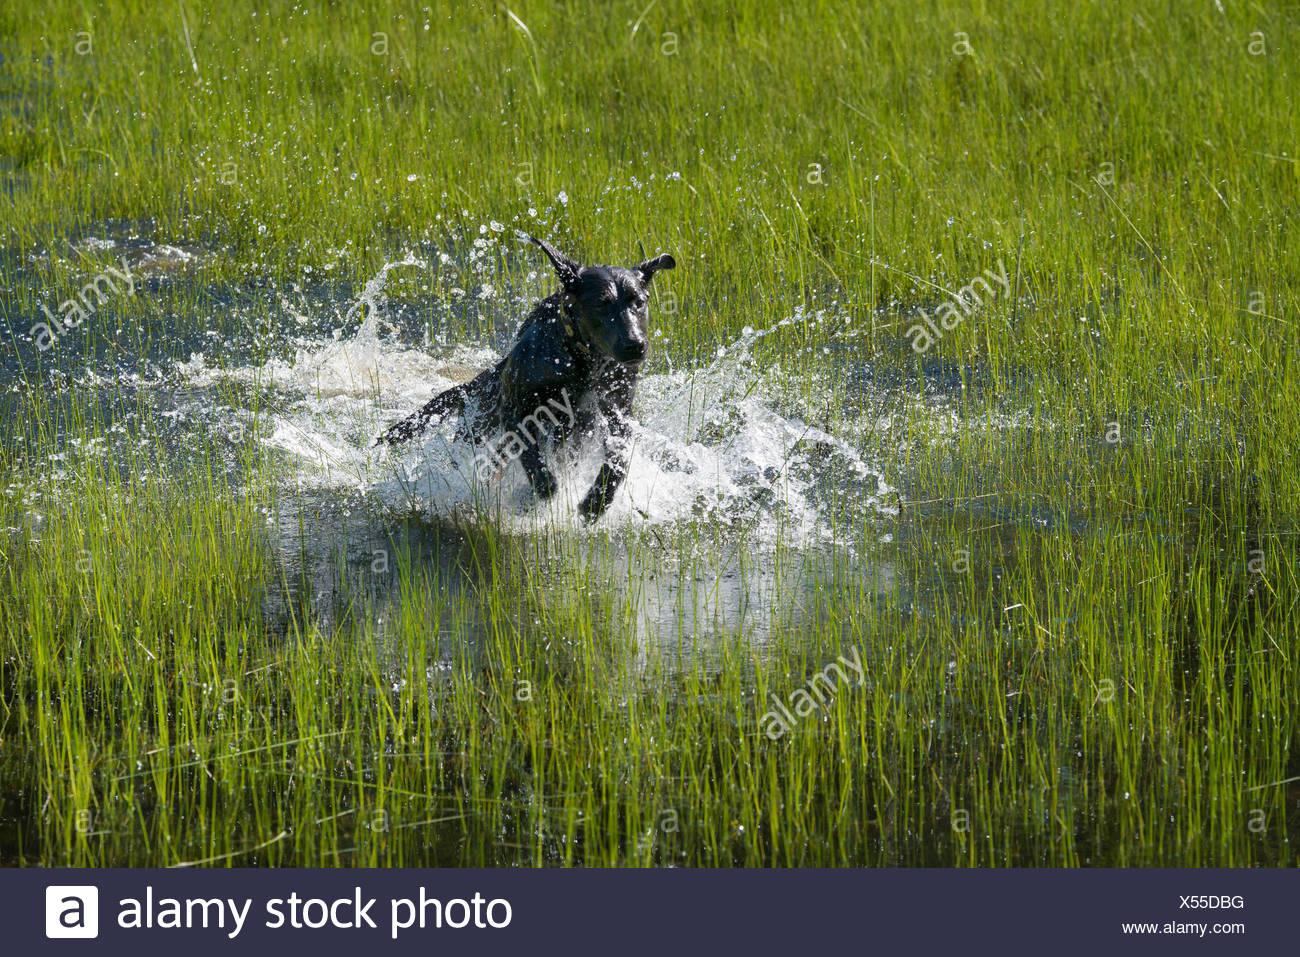 A black labrador dog bounding through shallow water. - Stock Image